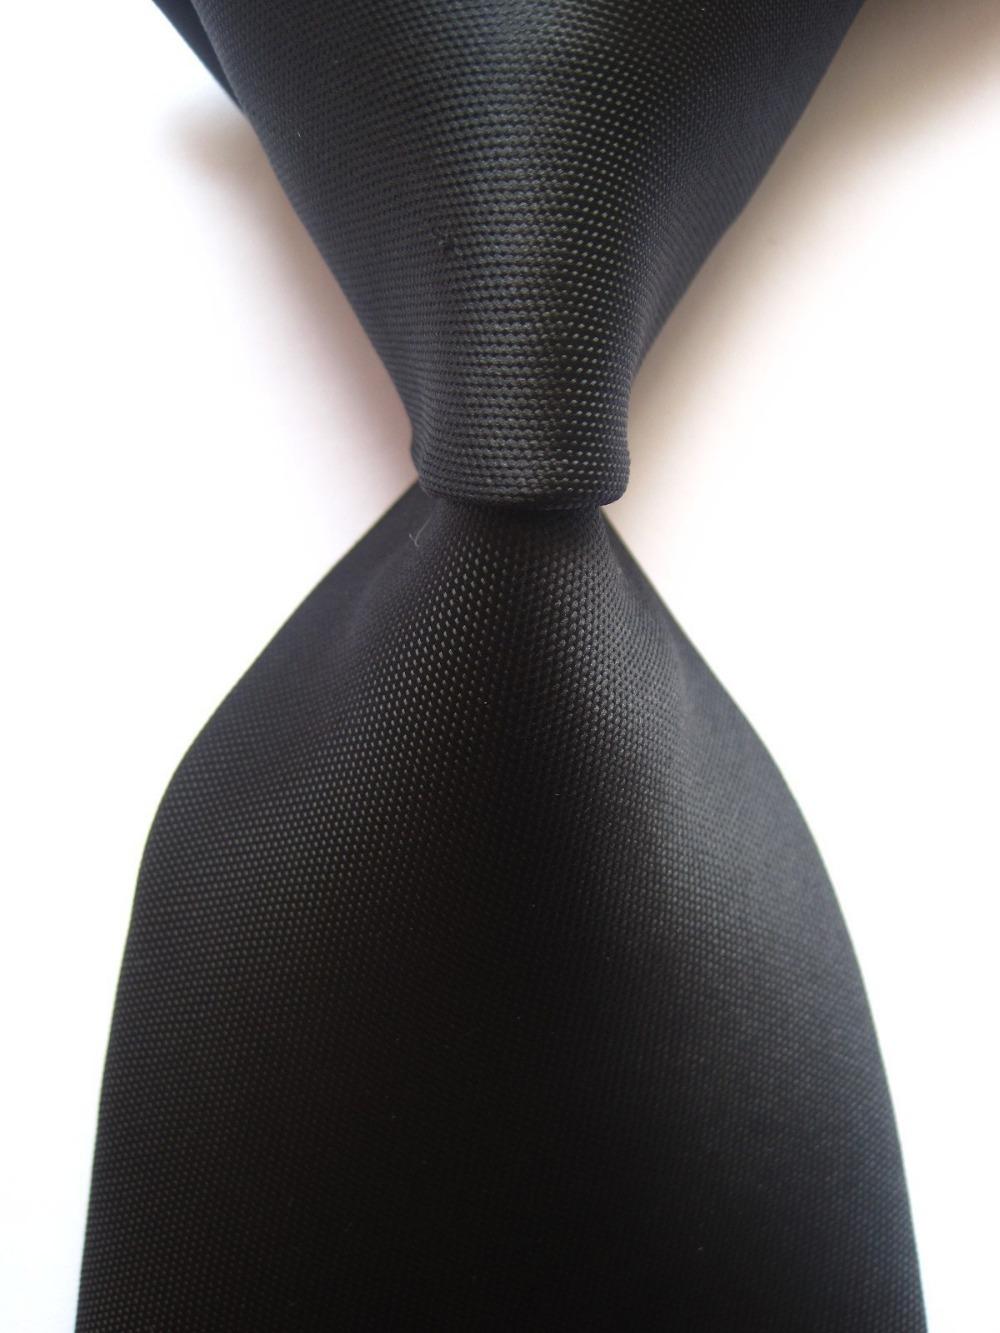 New Classic Plain Solid Black JACQUARD WOVEN 100% Silk Men's Tie Necktie SN291(China (Mainland))